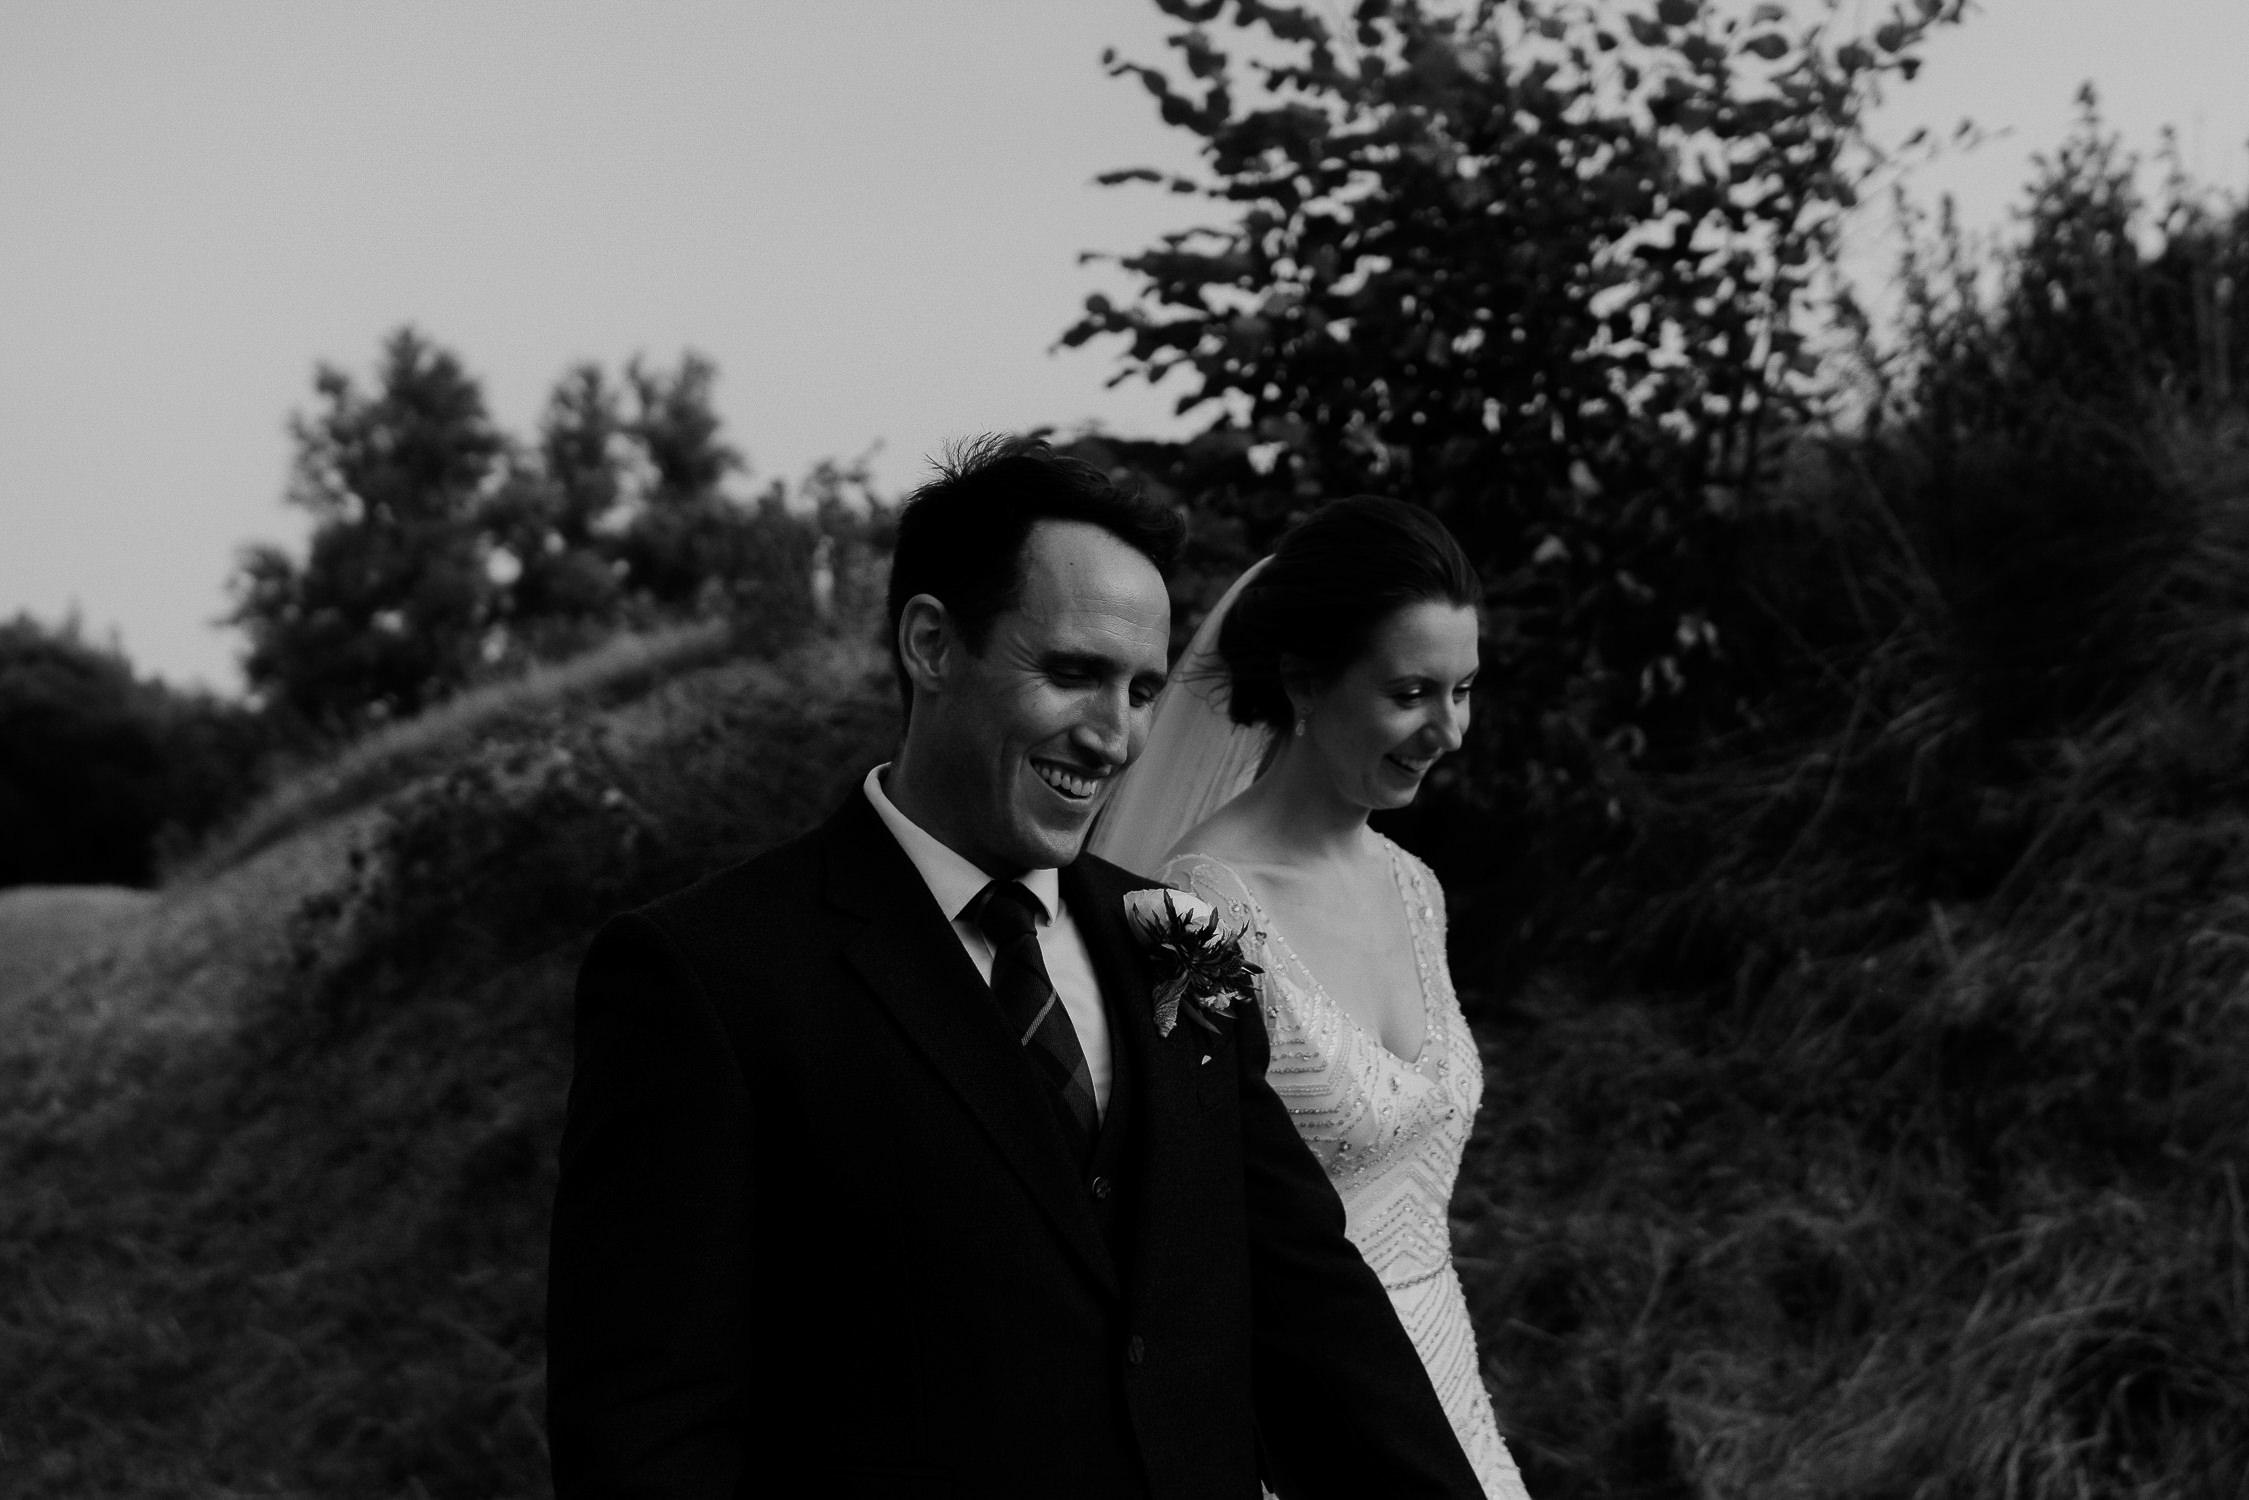 bruidsfotografie-trouwfotograaf-amsterdam-utrecht-mark-hadden-Laura-Craig-288-2.jpg